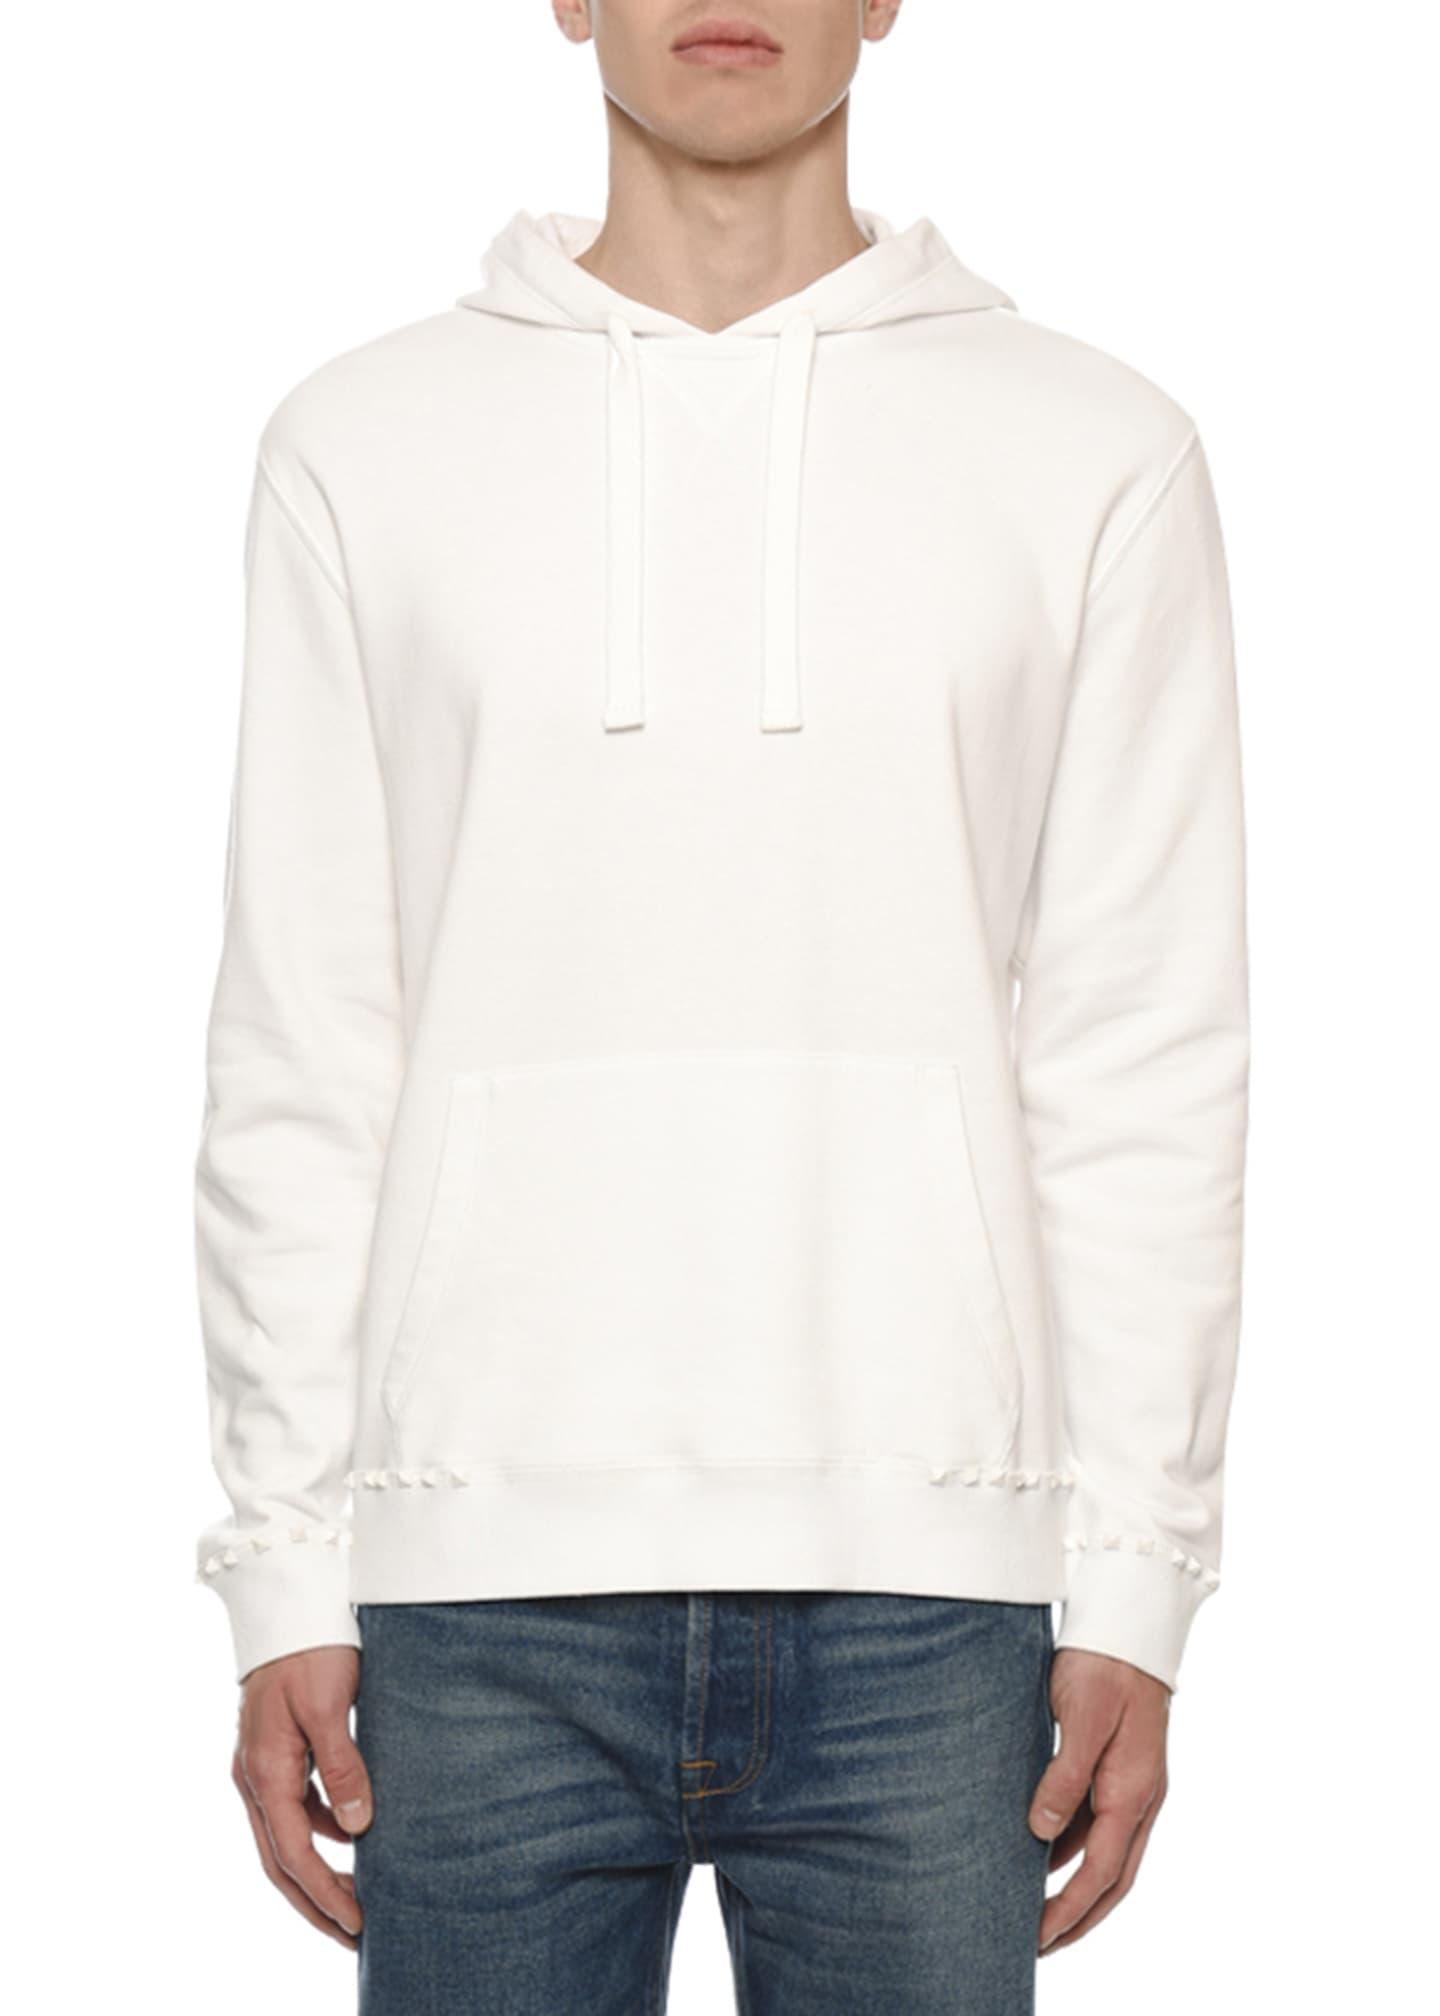 Valentino Men's Rockstud-Trim Jersey Pullover Hoodie